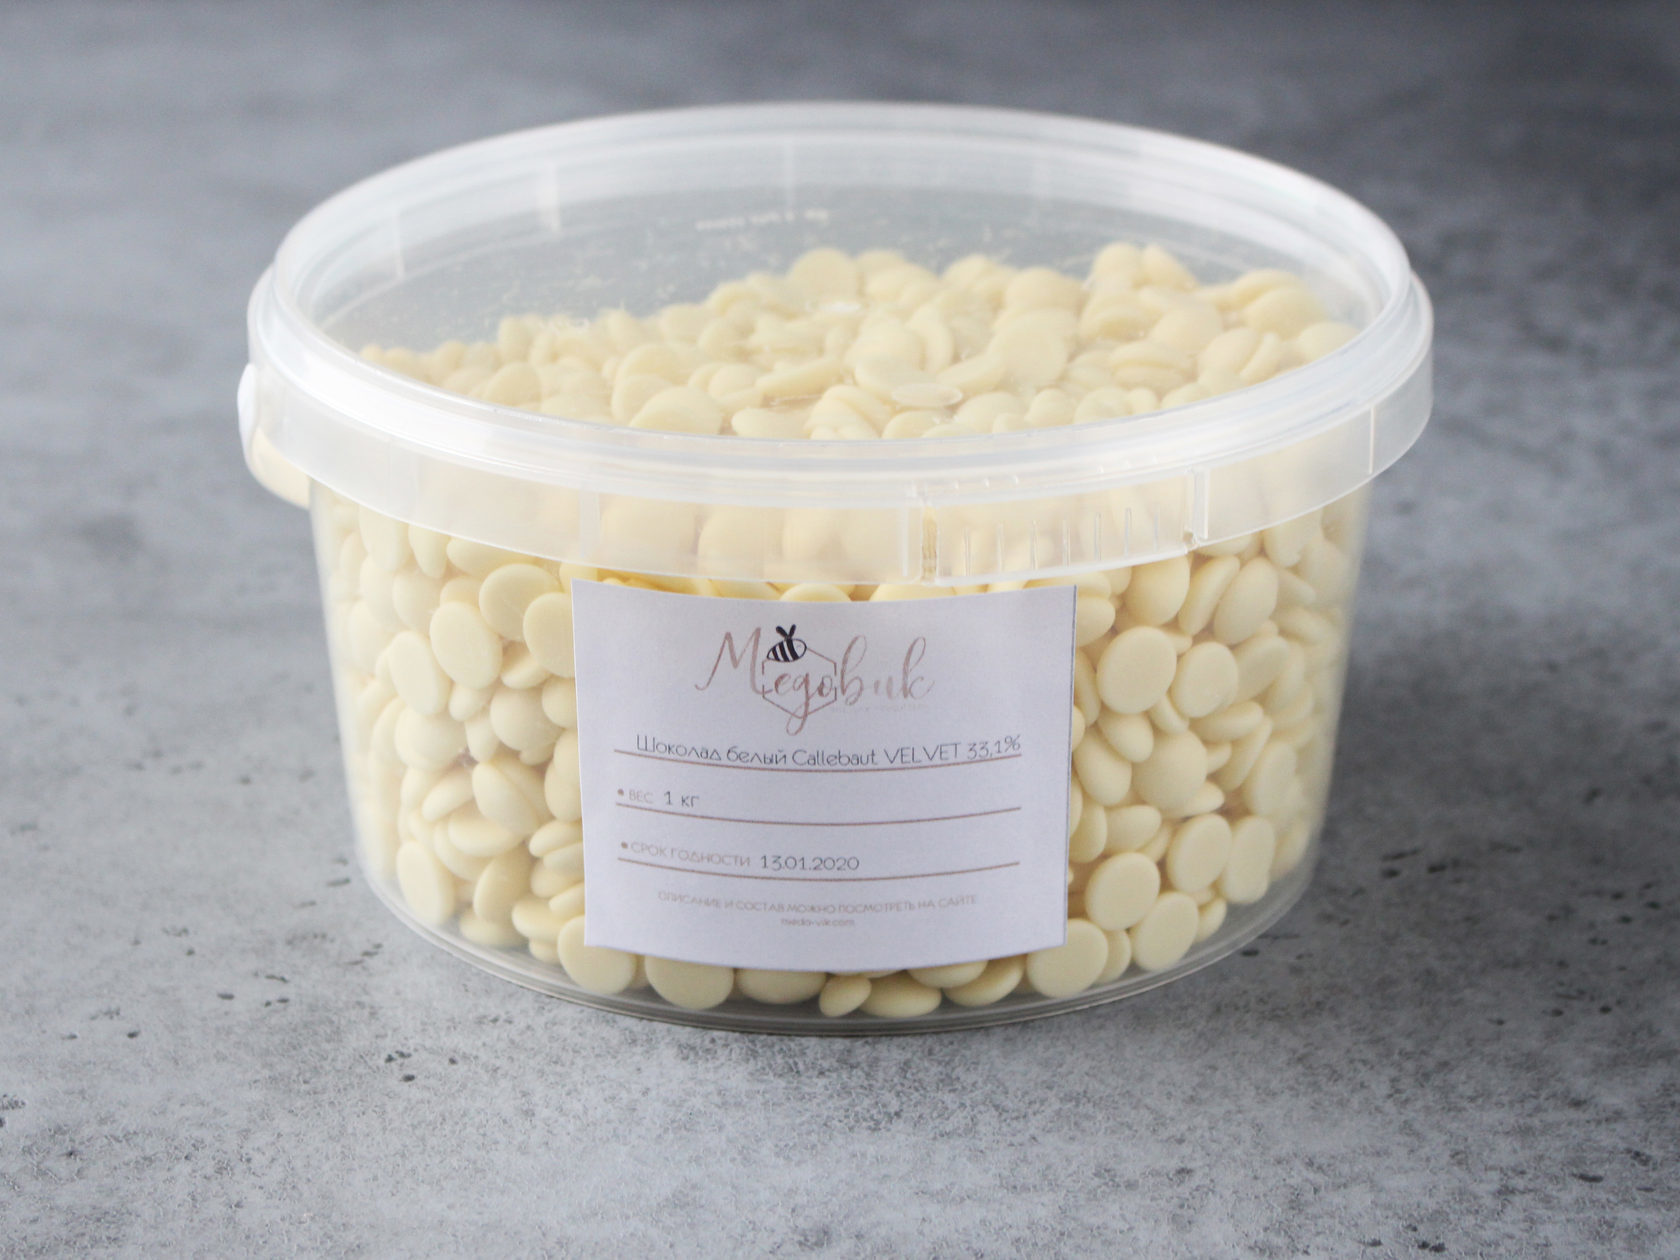 Шоколад белый Barry Callebaut Velvet 33,1%, 1 кг